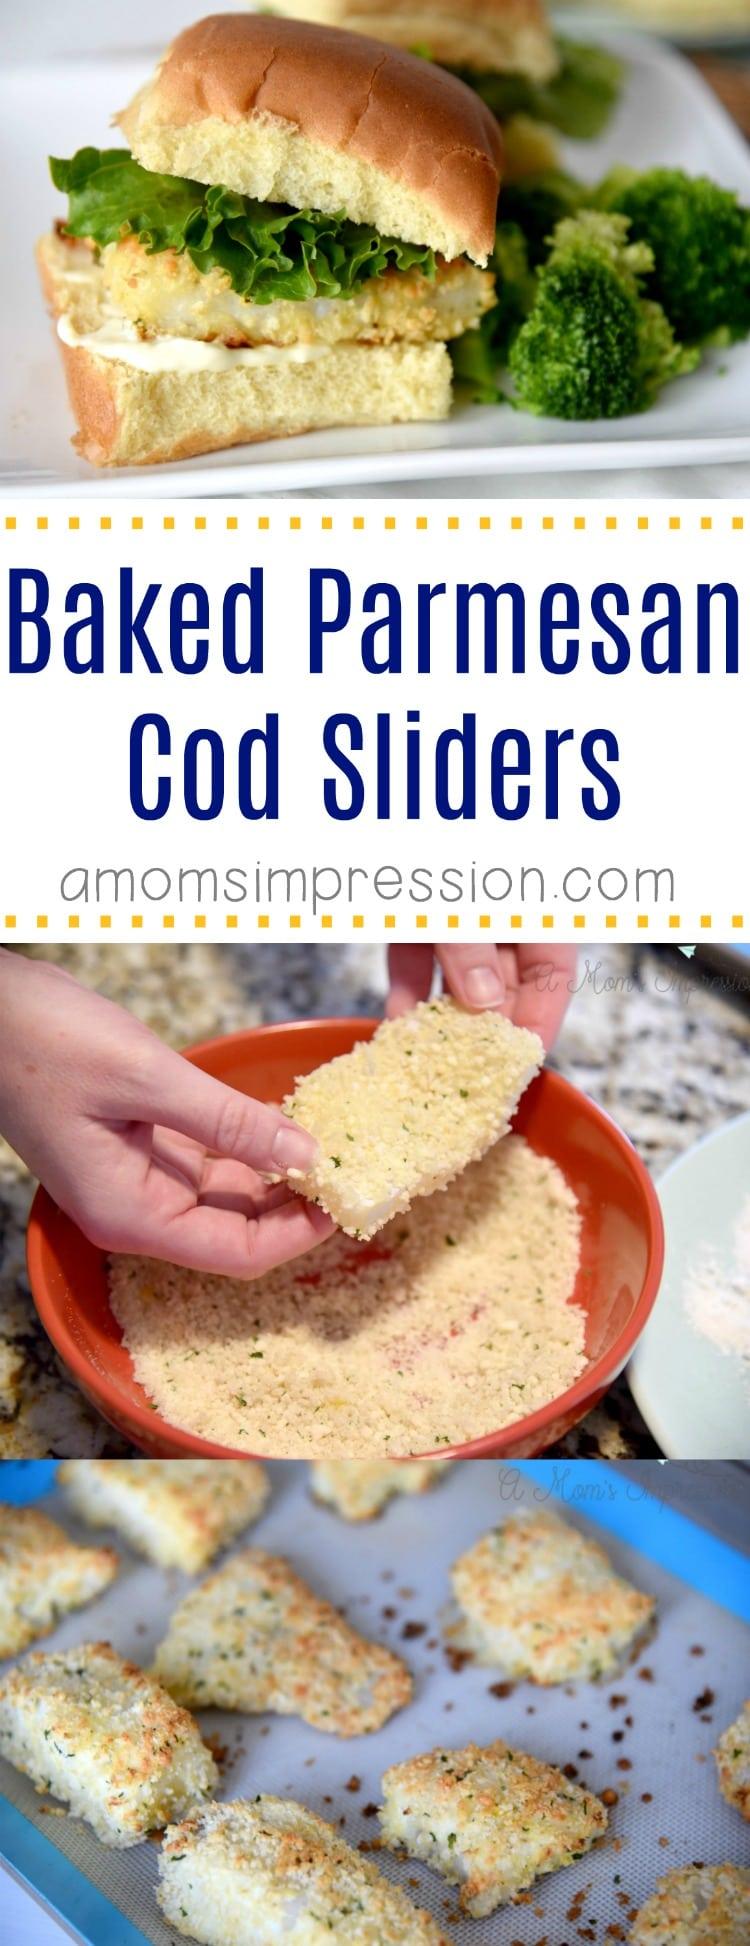 Baked Parmesan Alaska Cod Sliders pin